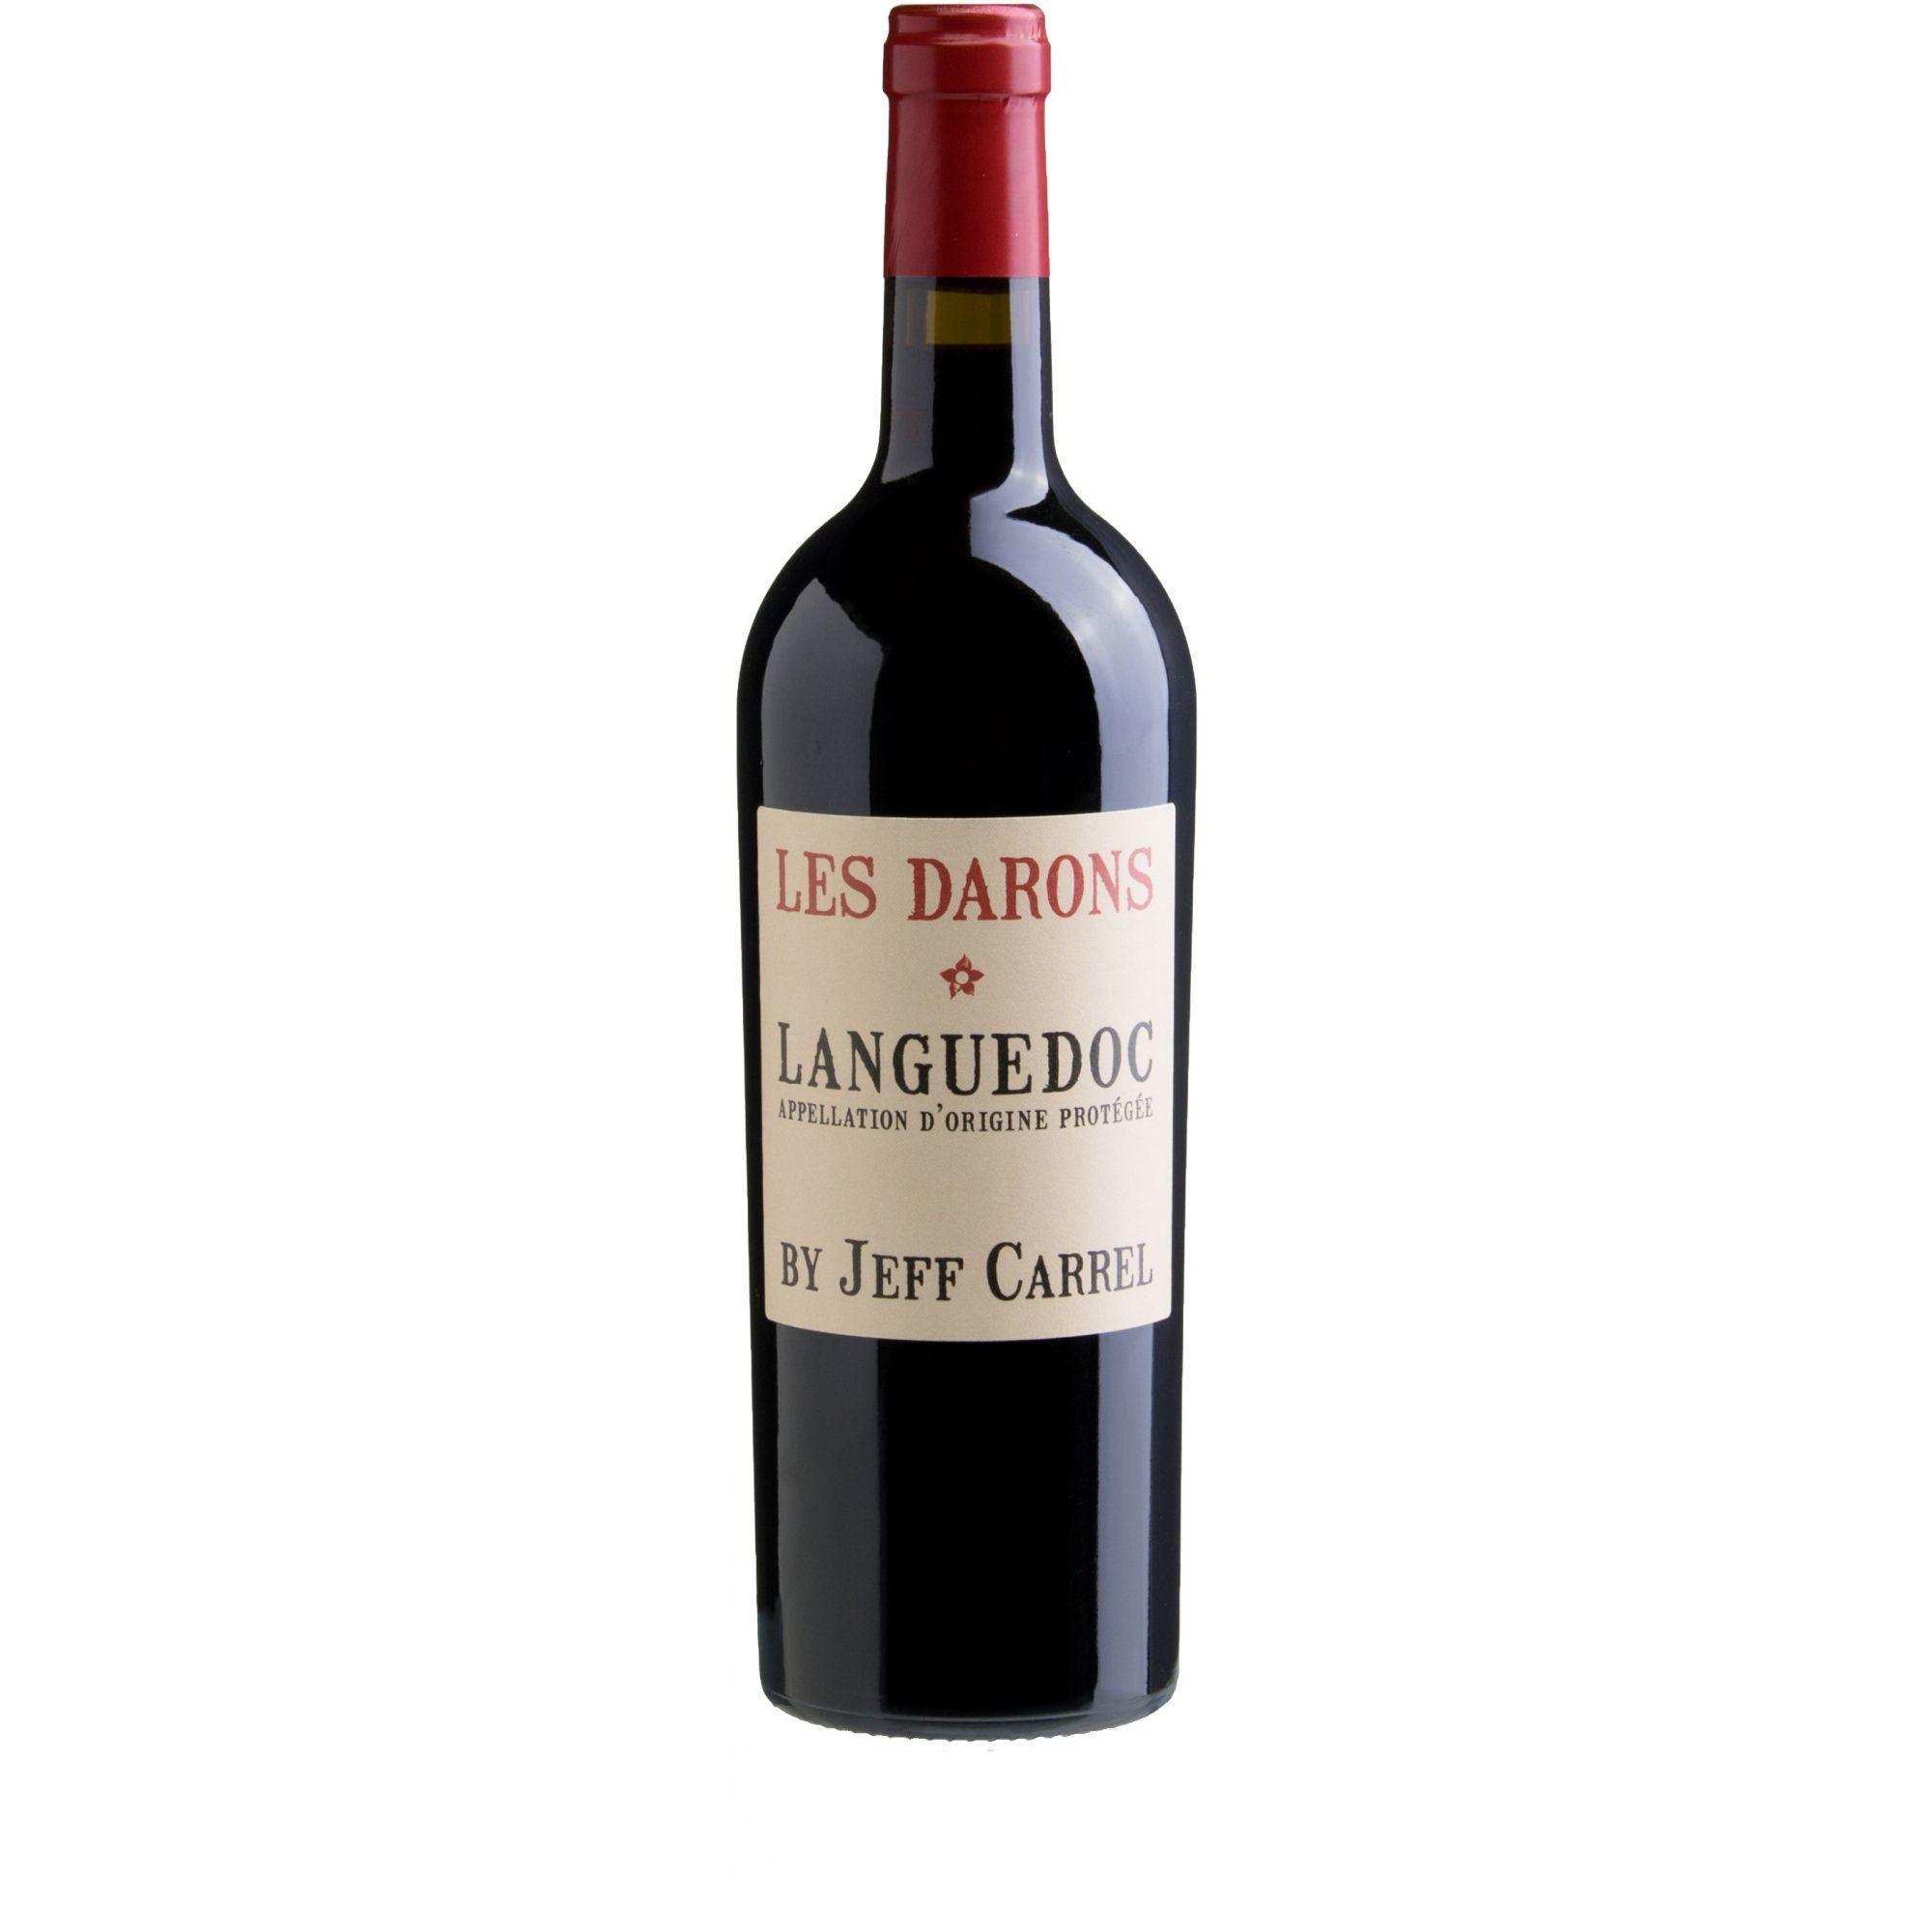 Vinho Les Darons Languedoc